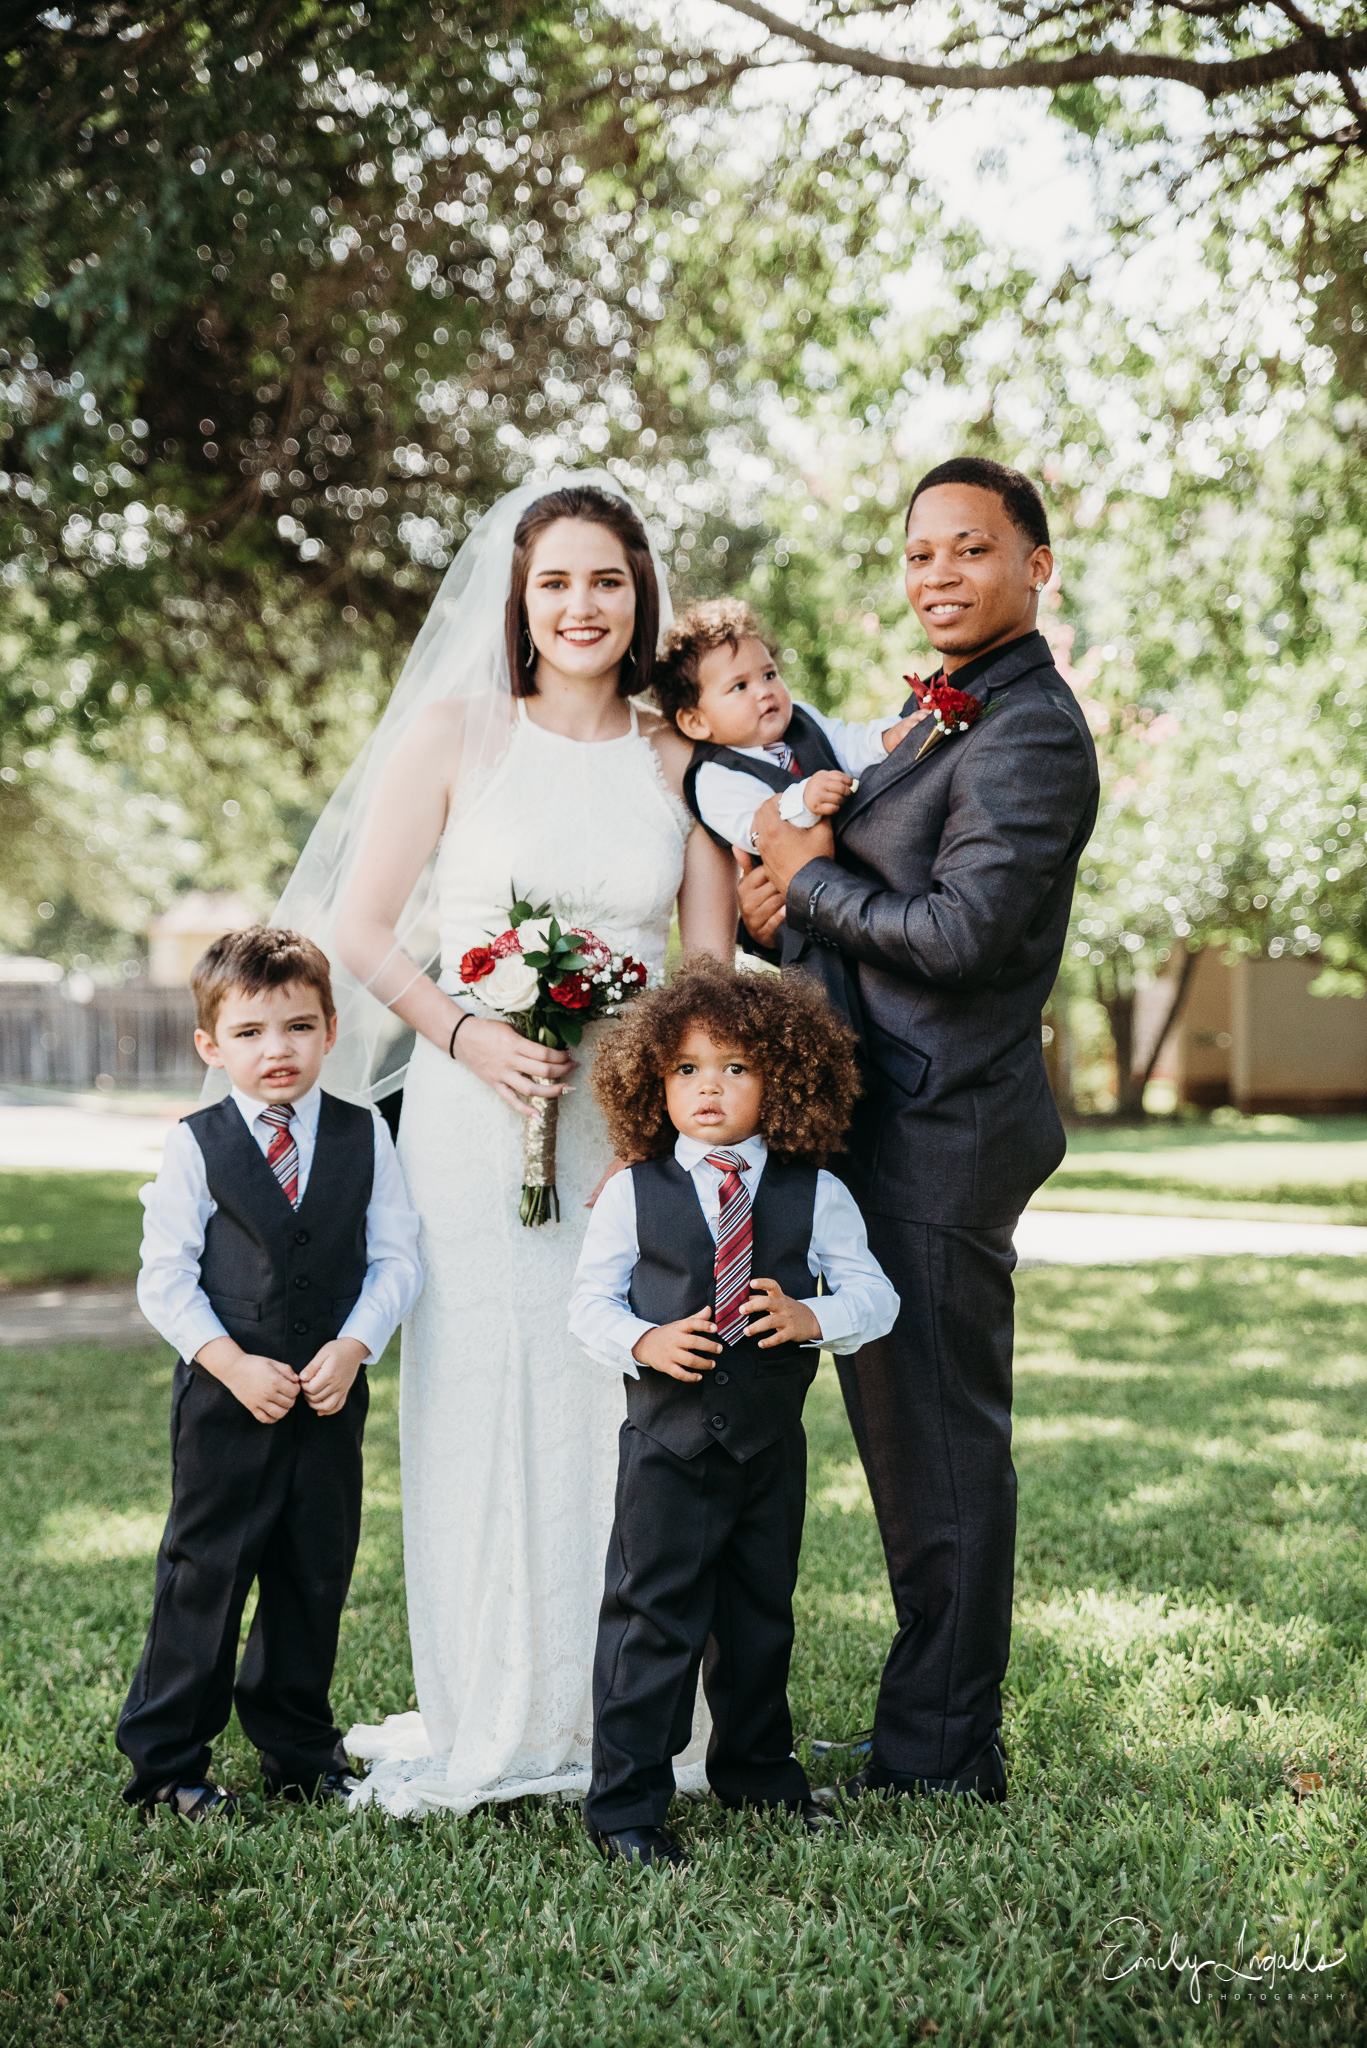 Wedding Photographer_Round Rock Wedding Photographer_Emily Ingalls Photography_Austin Photographer_Pflugerville Wedding Photographer_Georgetown Photographer-9.jpg